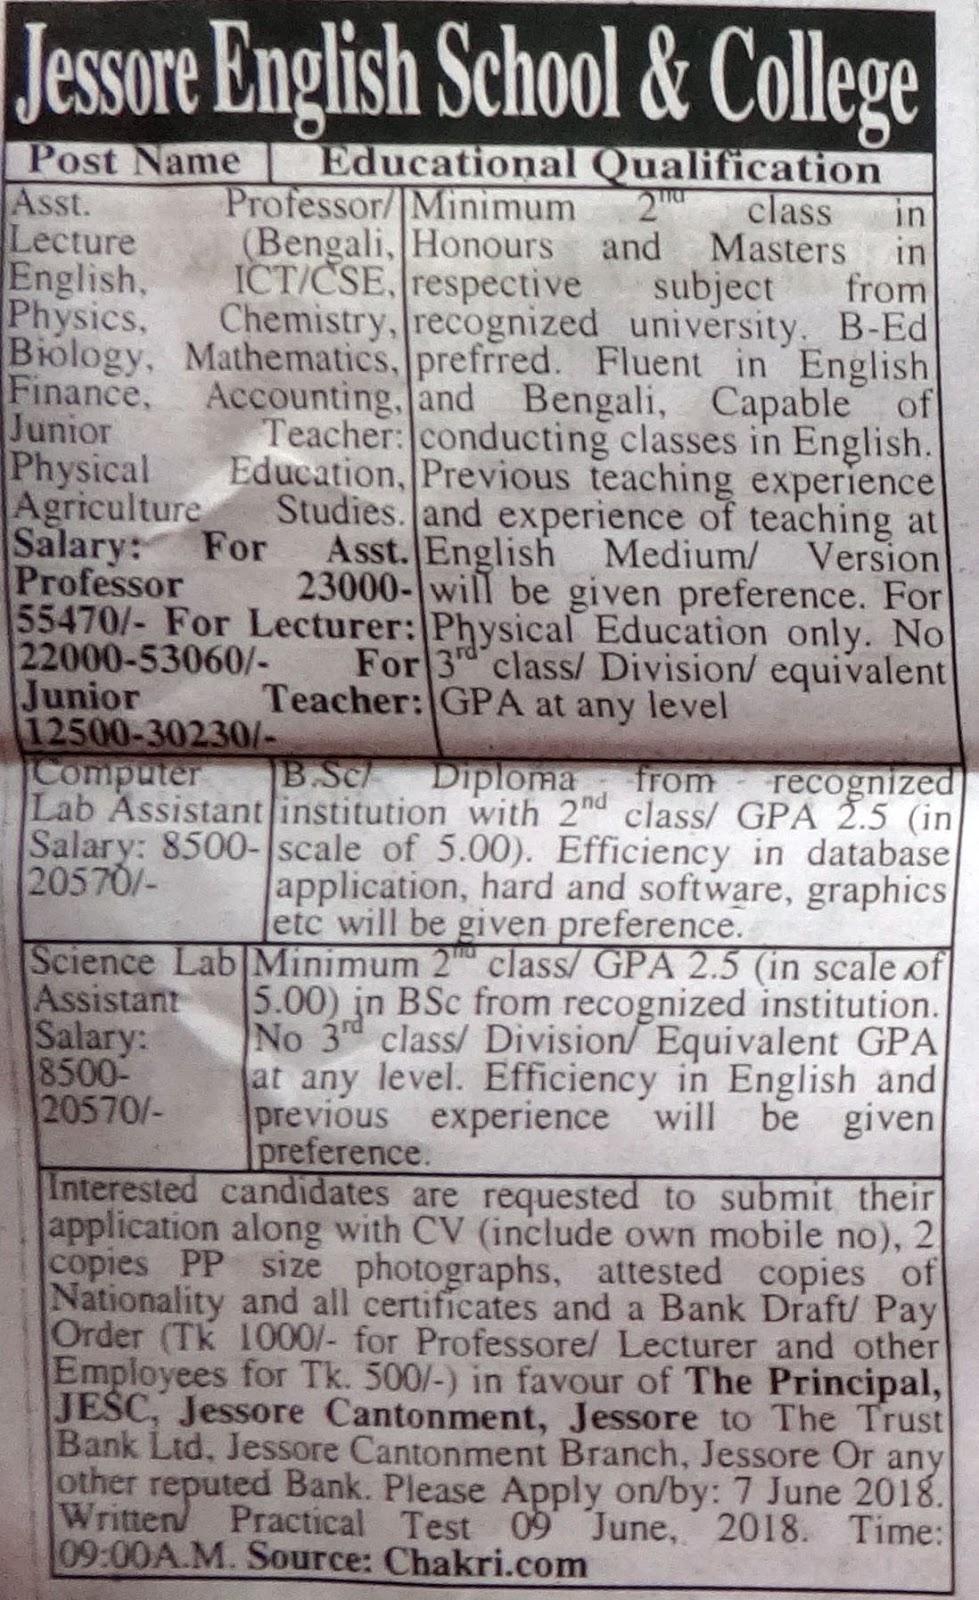 Jessore English School and College job circular 2018